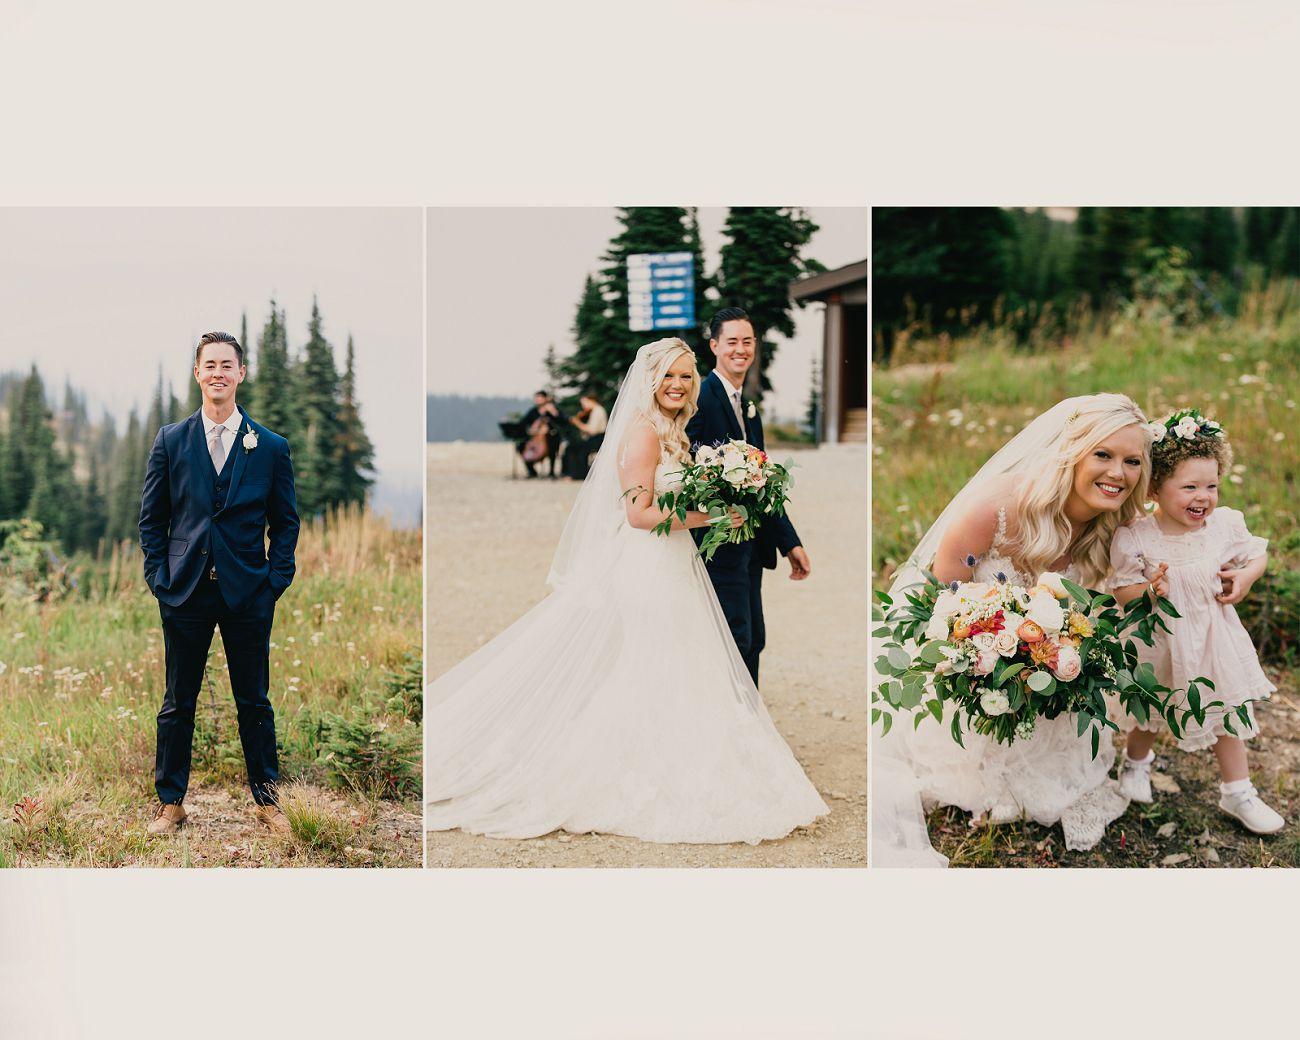 Jennifer_Mooney_Photo_Whitefish_mountain_resort_wedding_elegant_montana_wedding_011.jpg